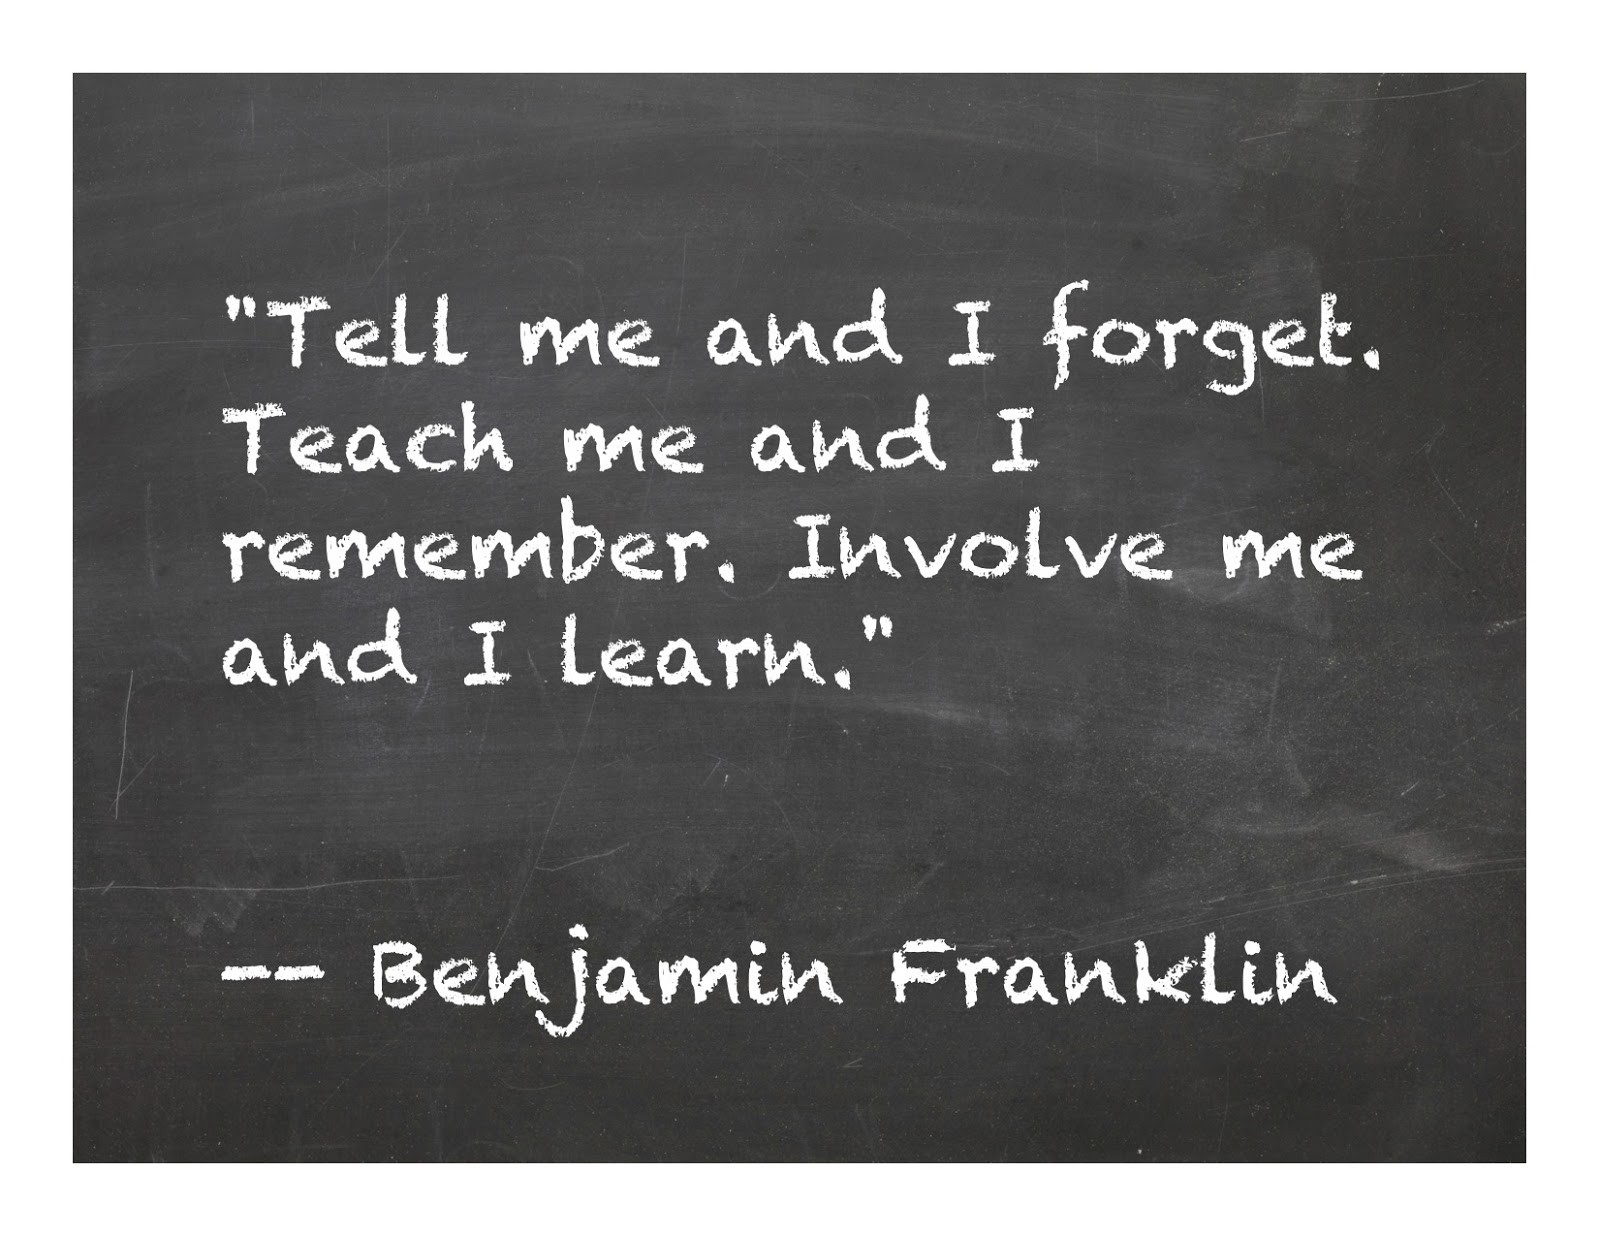 teaching_quotes_benjamin_franklin.jpg